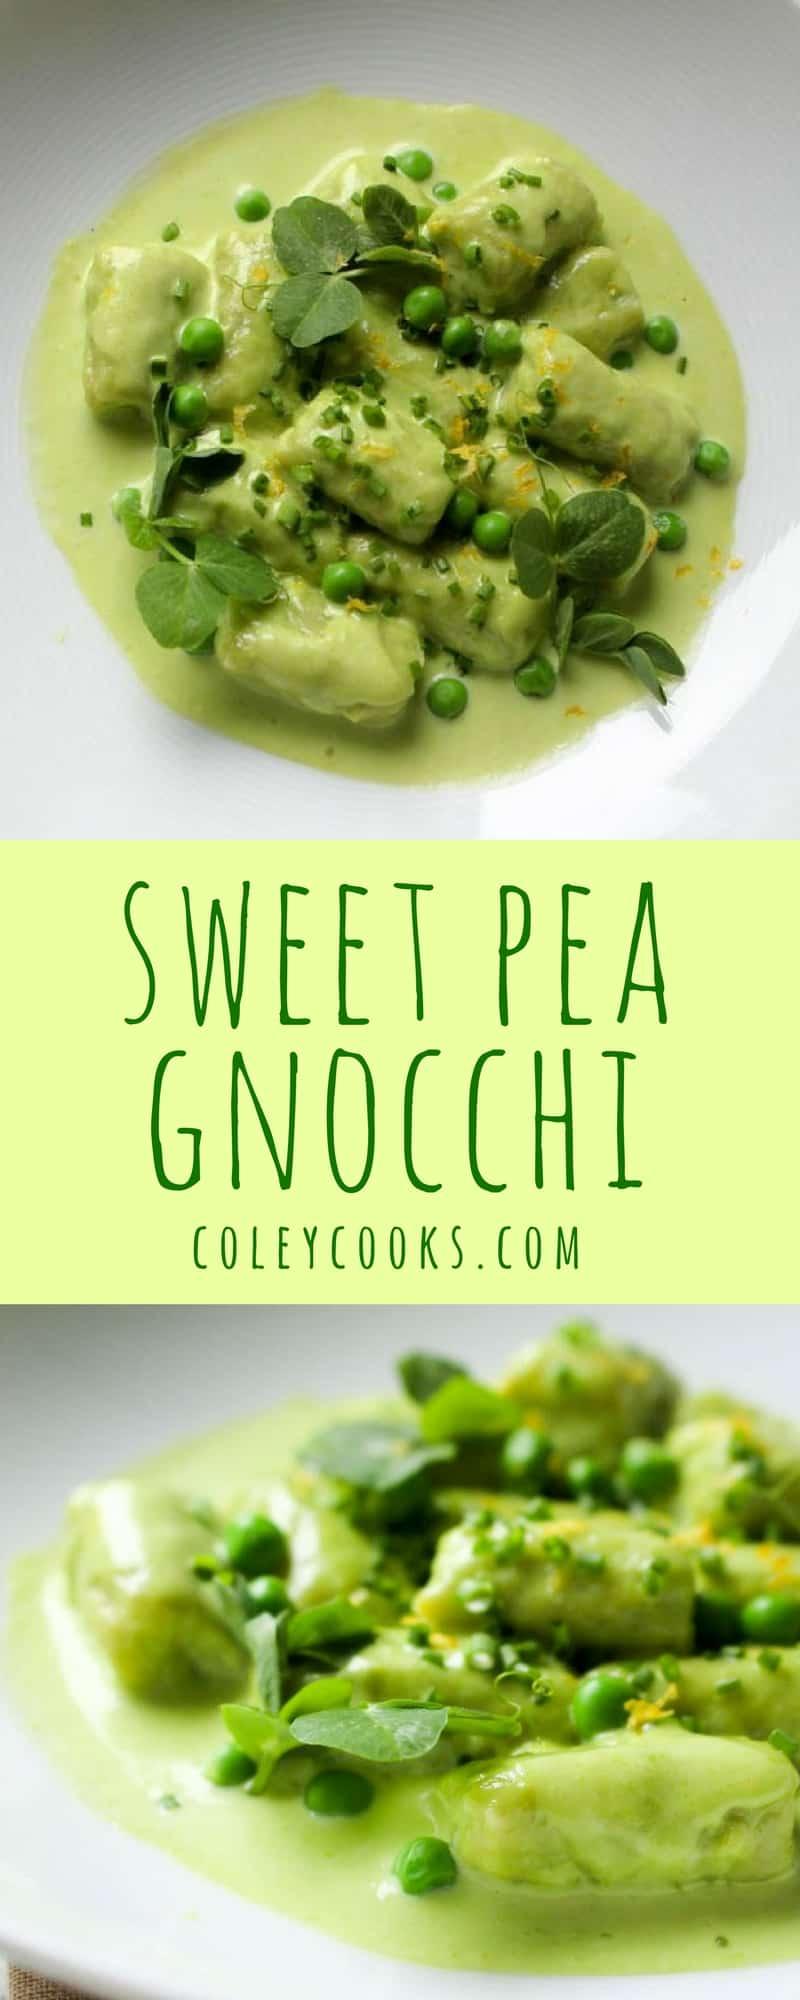 SWEET PEA GNOCCHI with Tarragon Pea Cream | A Beautiful Spring Recipe | ColeyCooks.com